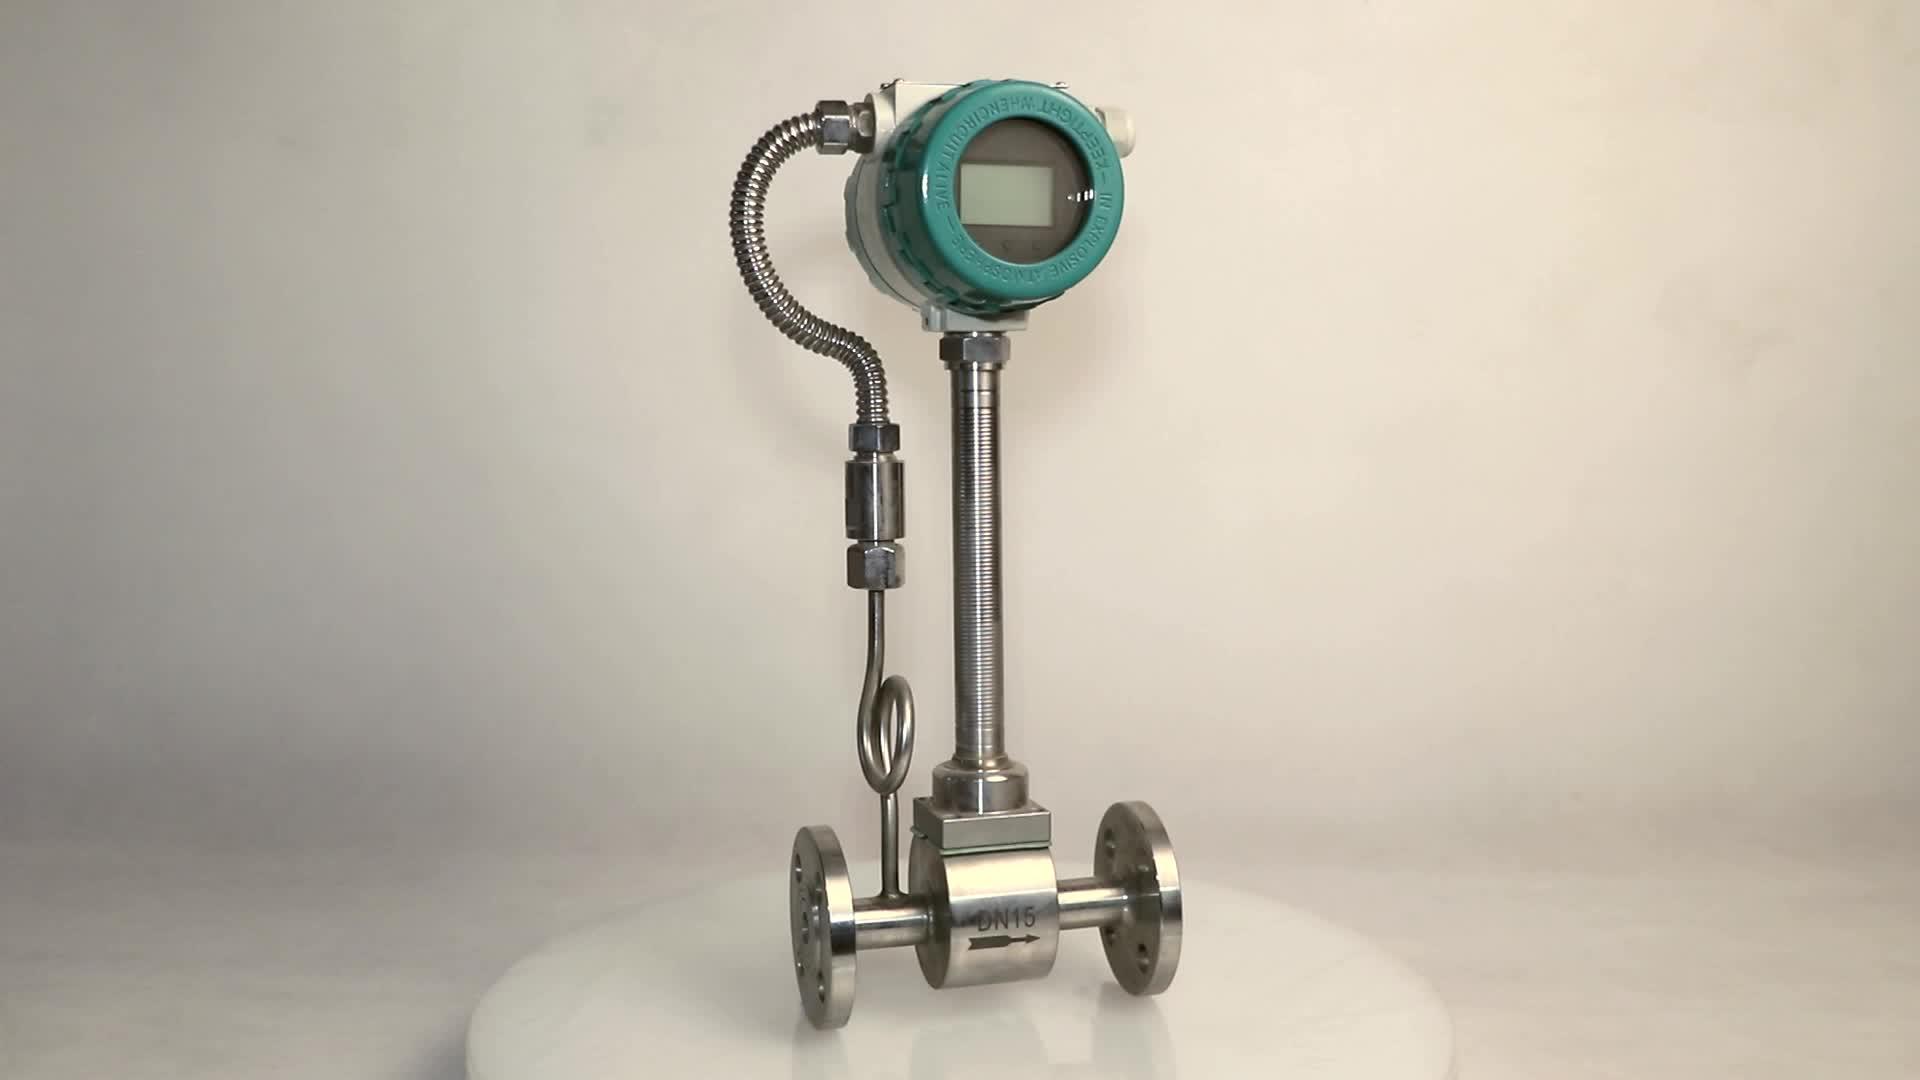 Di alta precisione digitale da stiro a vapore a gas liquido misuratore di portata vortex